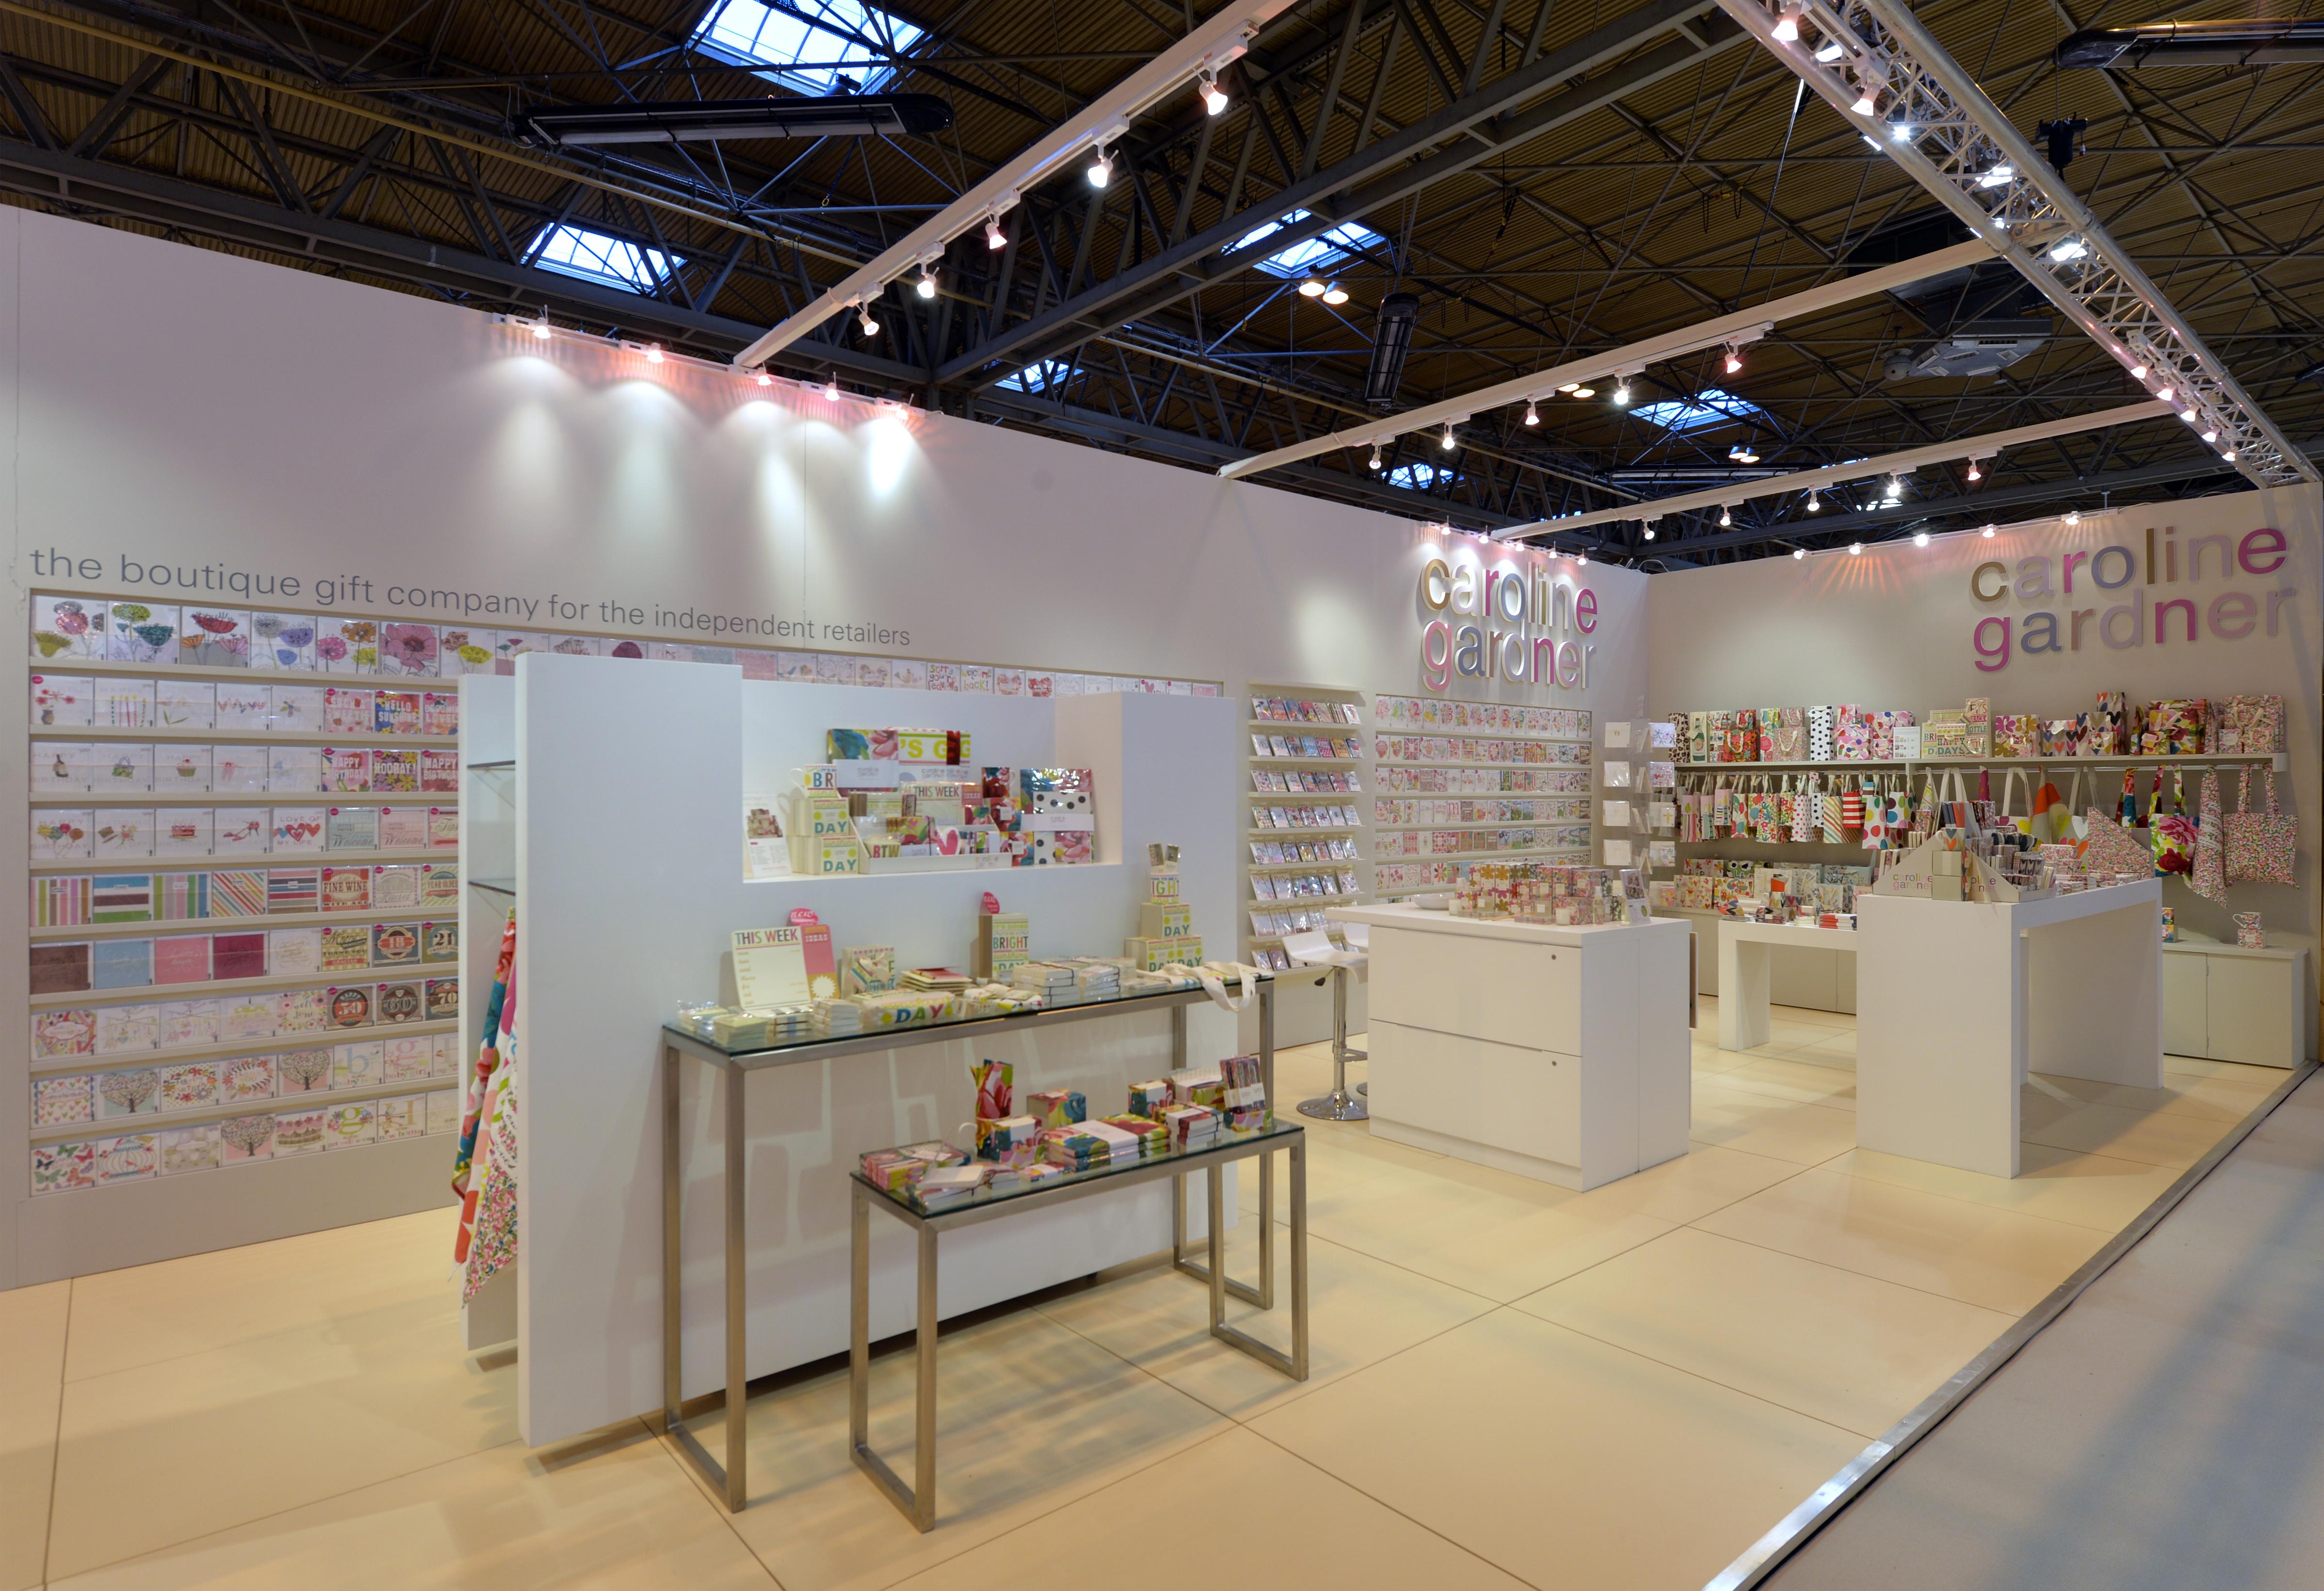 Exhibition Stand Design Yorkshire : Caroline gardner quantum exhibitions and displays